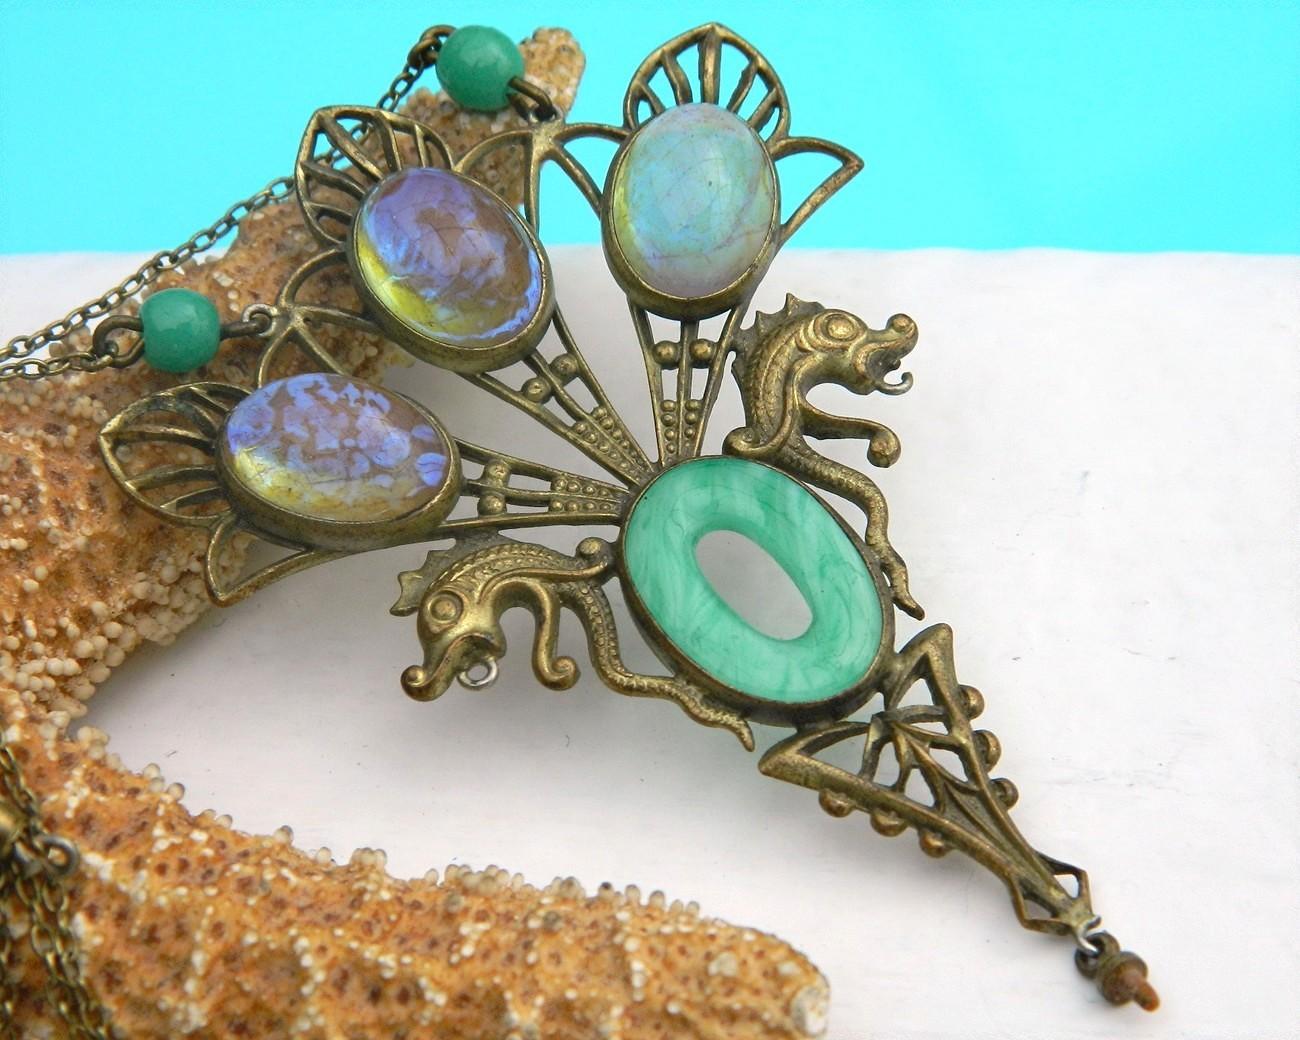 Vintage Fishel Nessler Art Deco Fish Pendant Necklace Brass